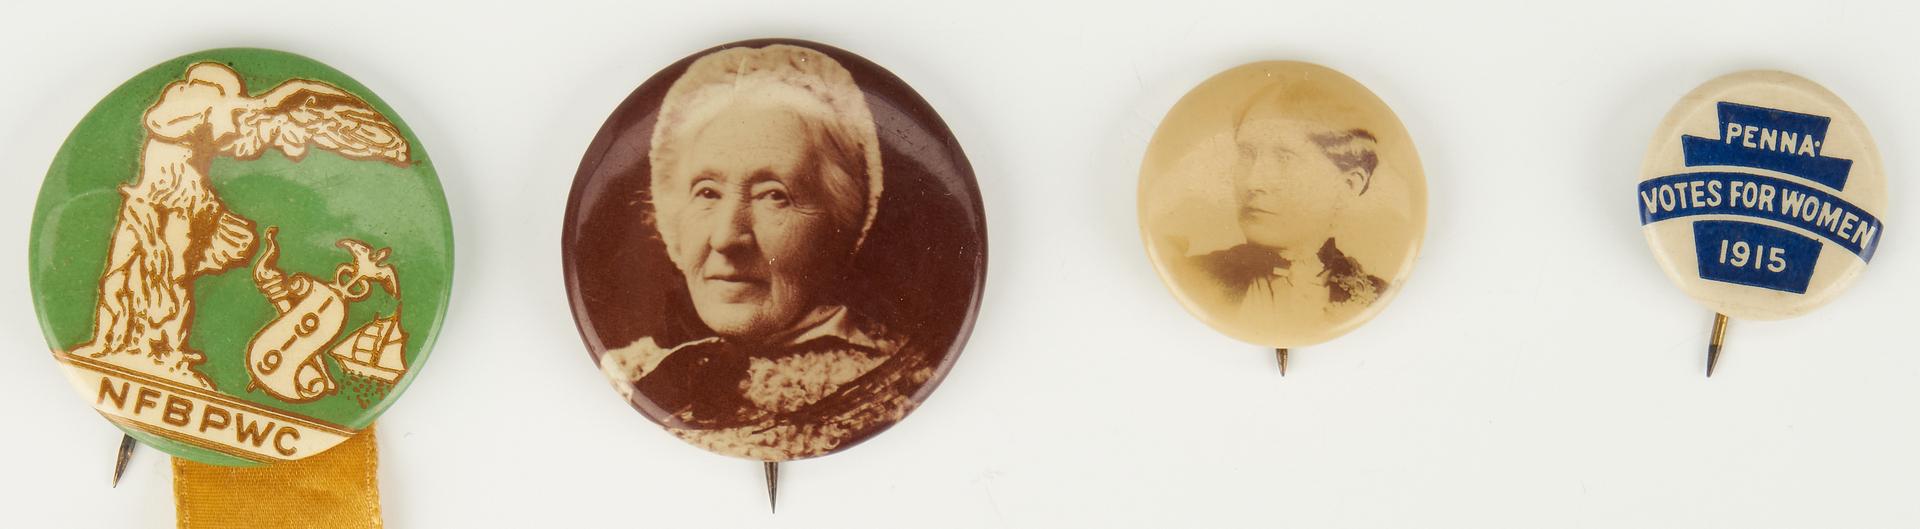 Lot 1019: 5 Women's Suffrage Related Ephemera Items